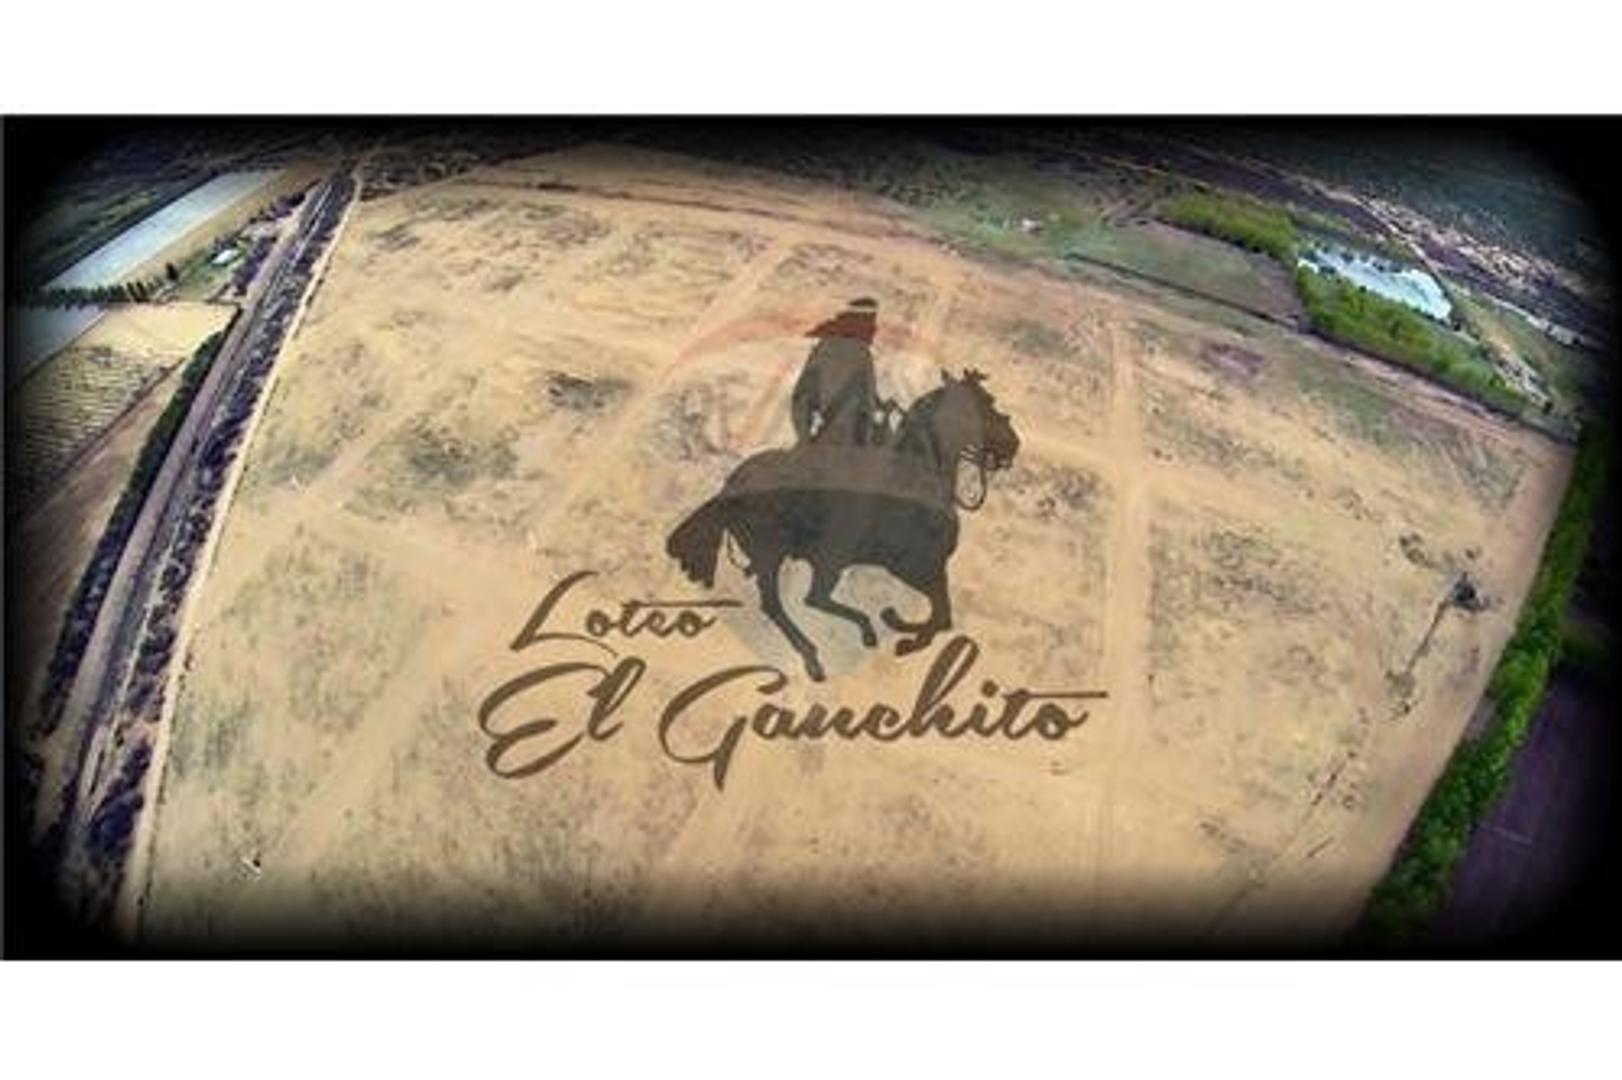 URBANIZACION  EL GAUCHITO- PLOTTIER. 300 MTS 2